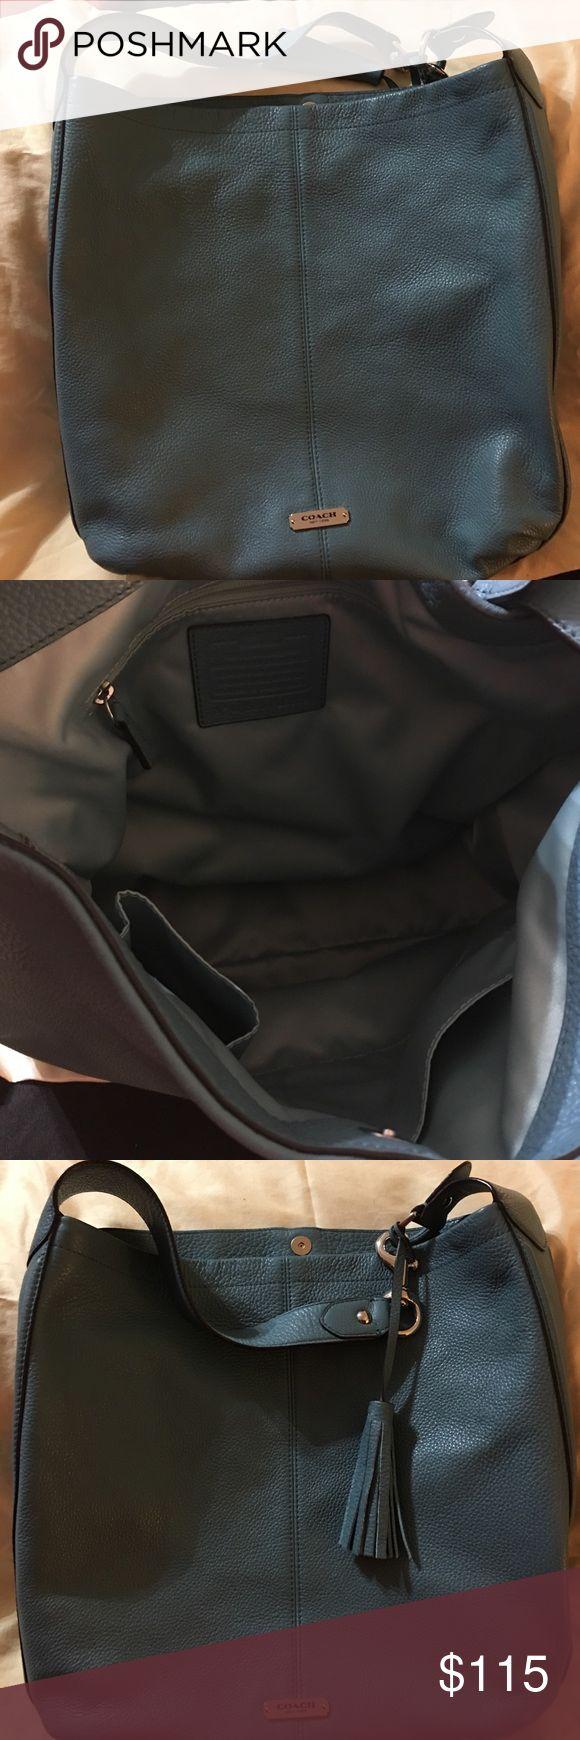 Coach Hobo Handbag Sea foam green Coach hobo bag. Excellent condition. Snap closure. Coach Bags Shoulder Bags